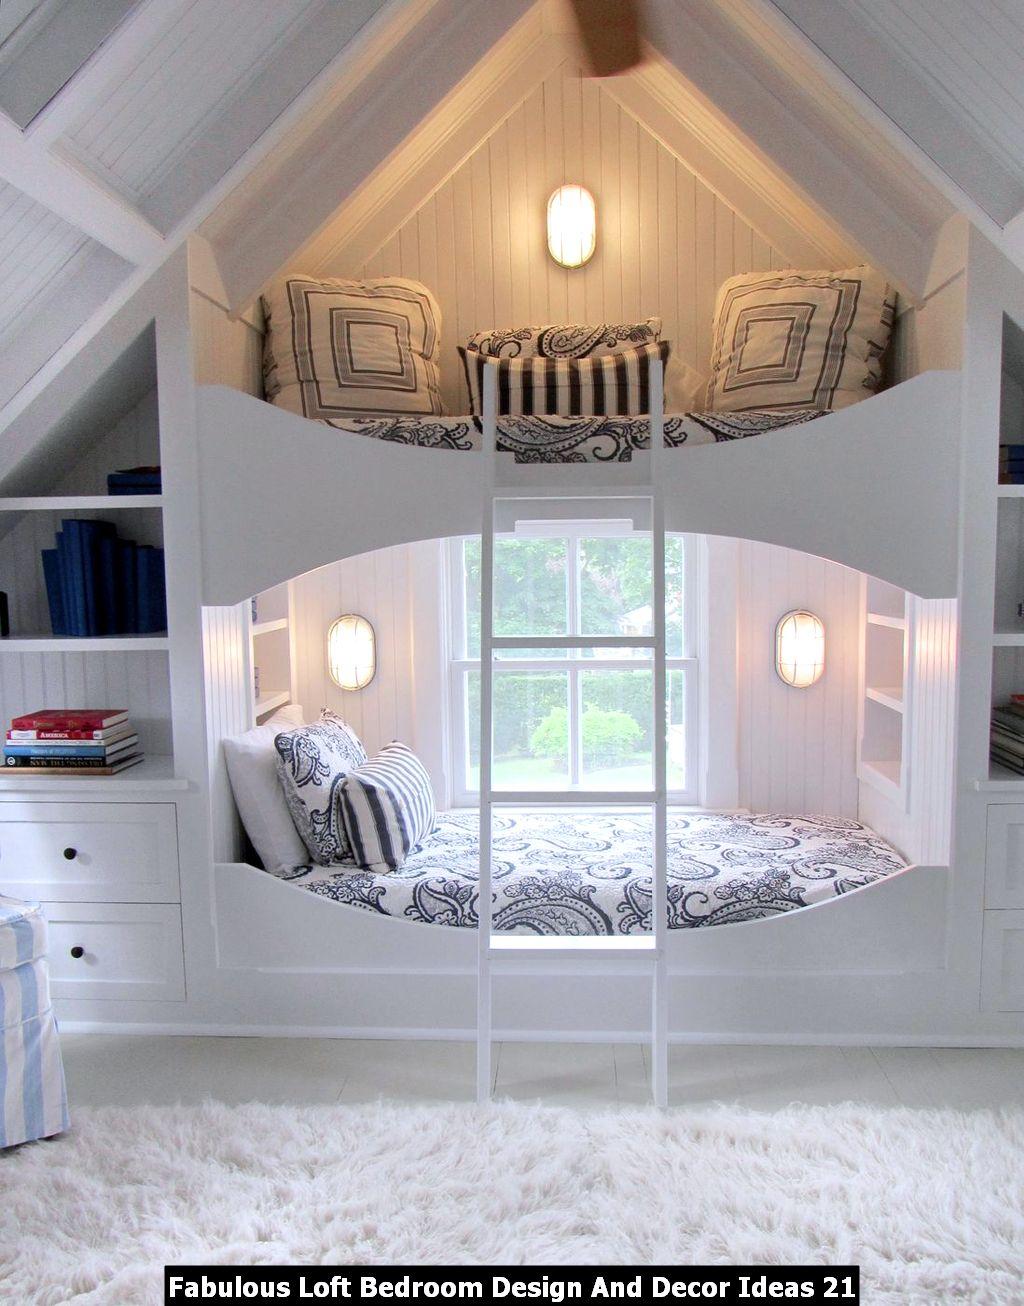 Fabulous Loft Bedroom Design And Decor Ideas 21